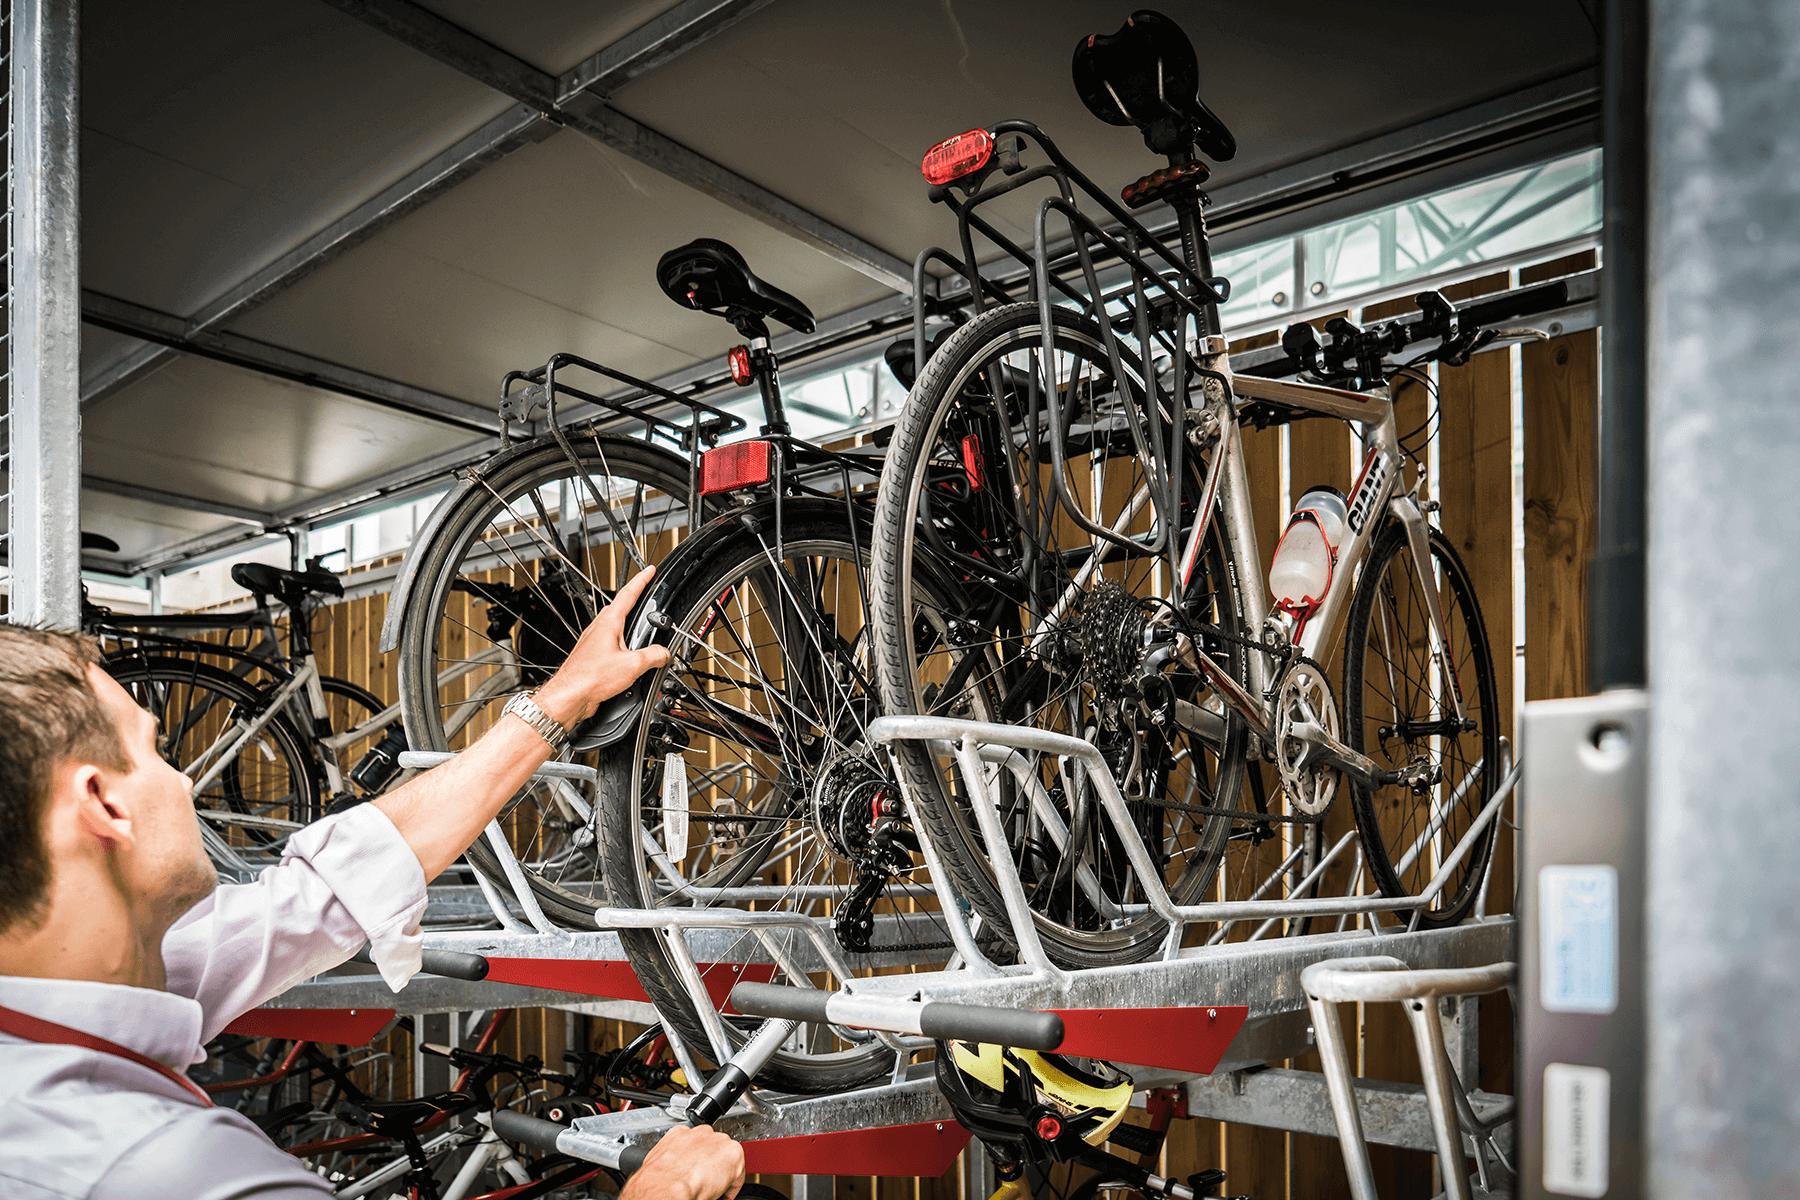 Gas-assisted Two Tier Bike Racks